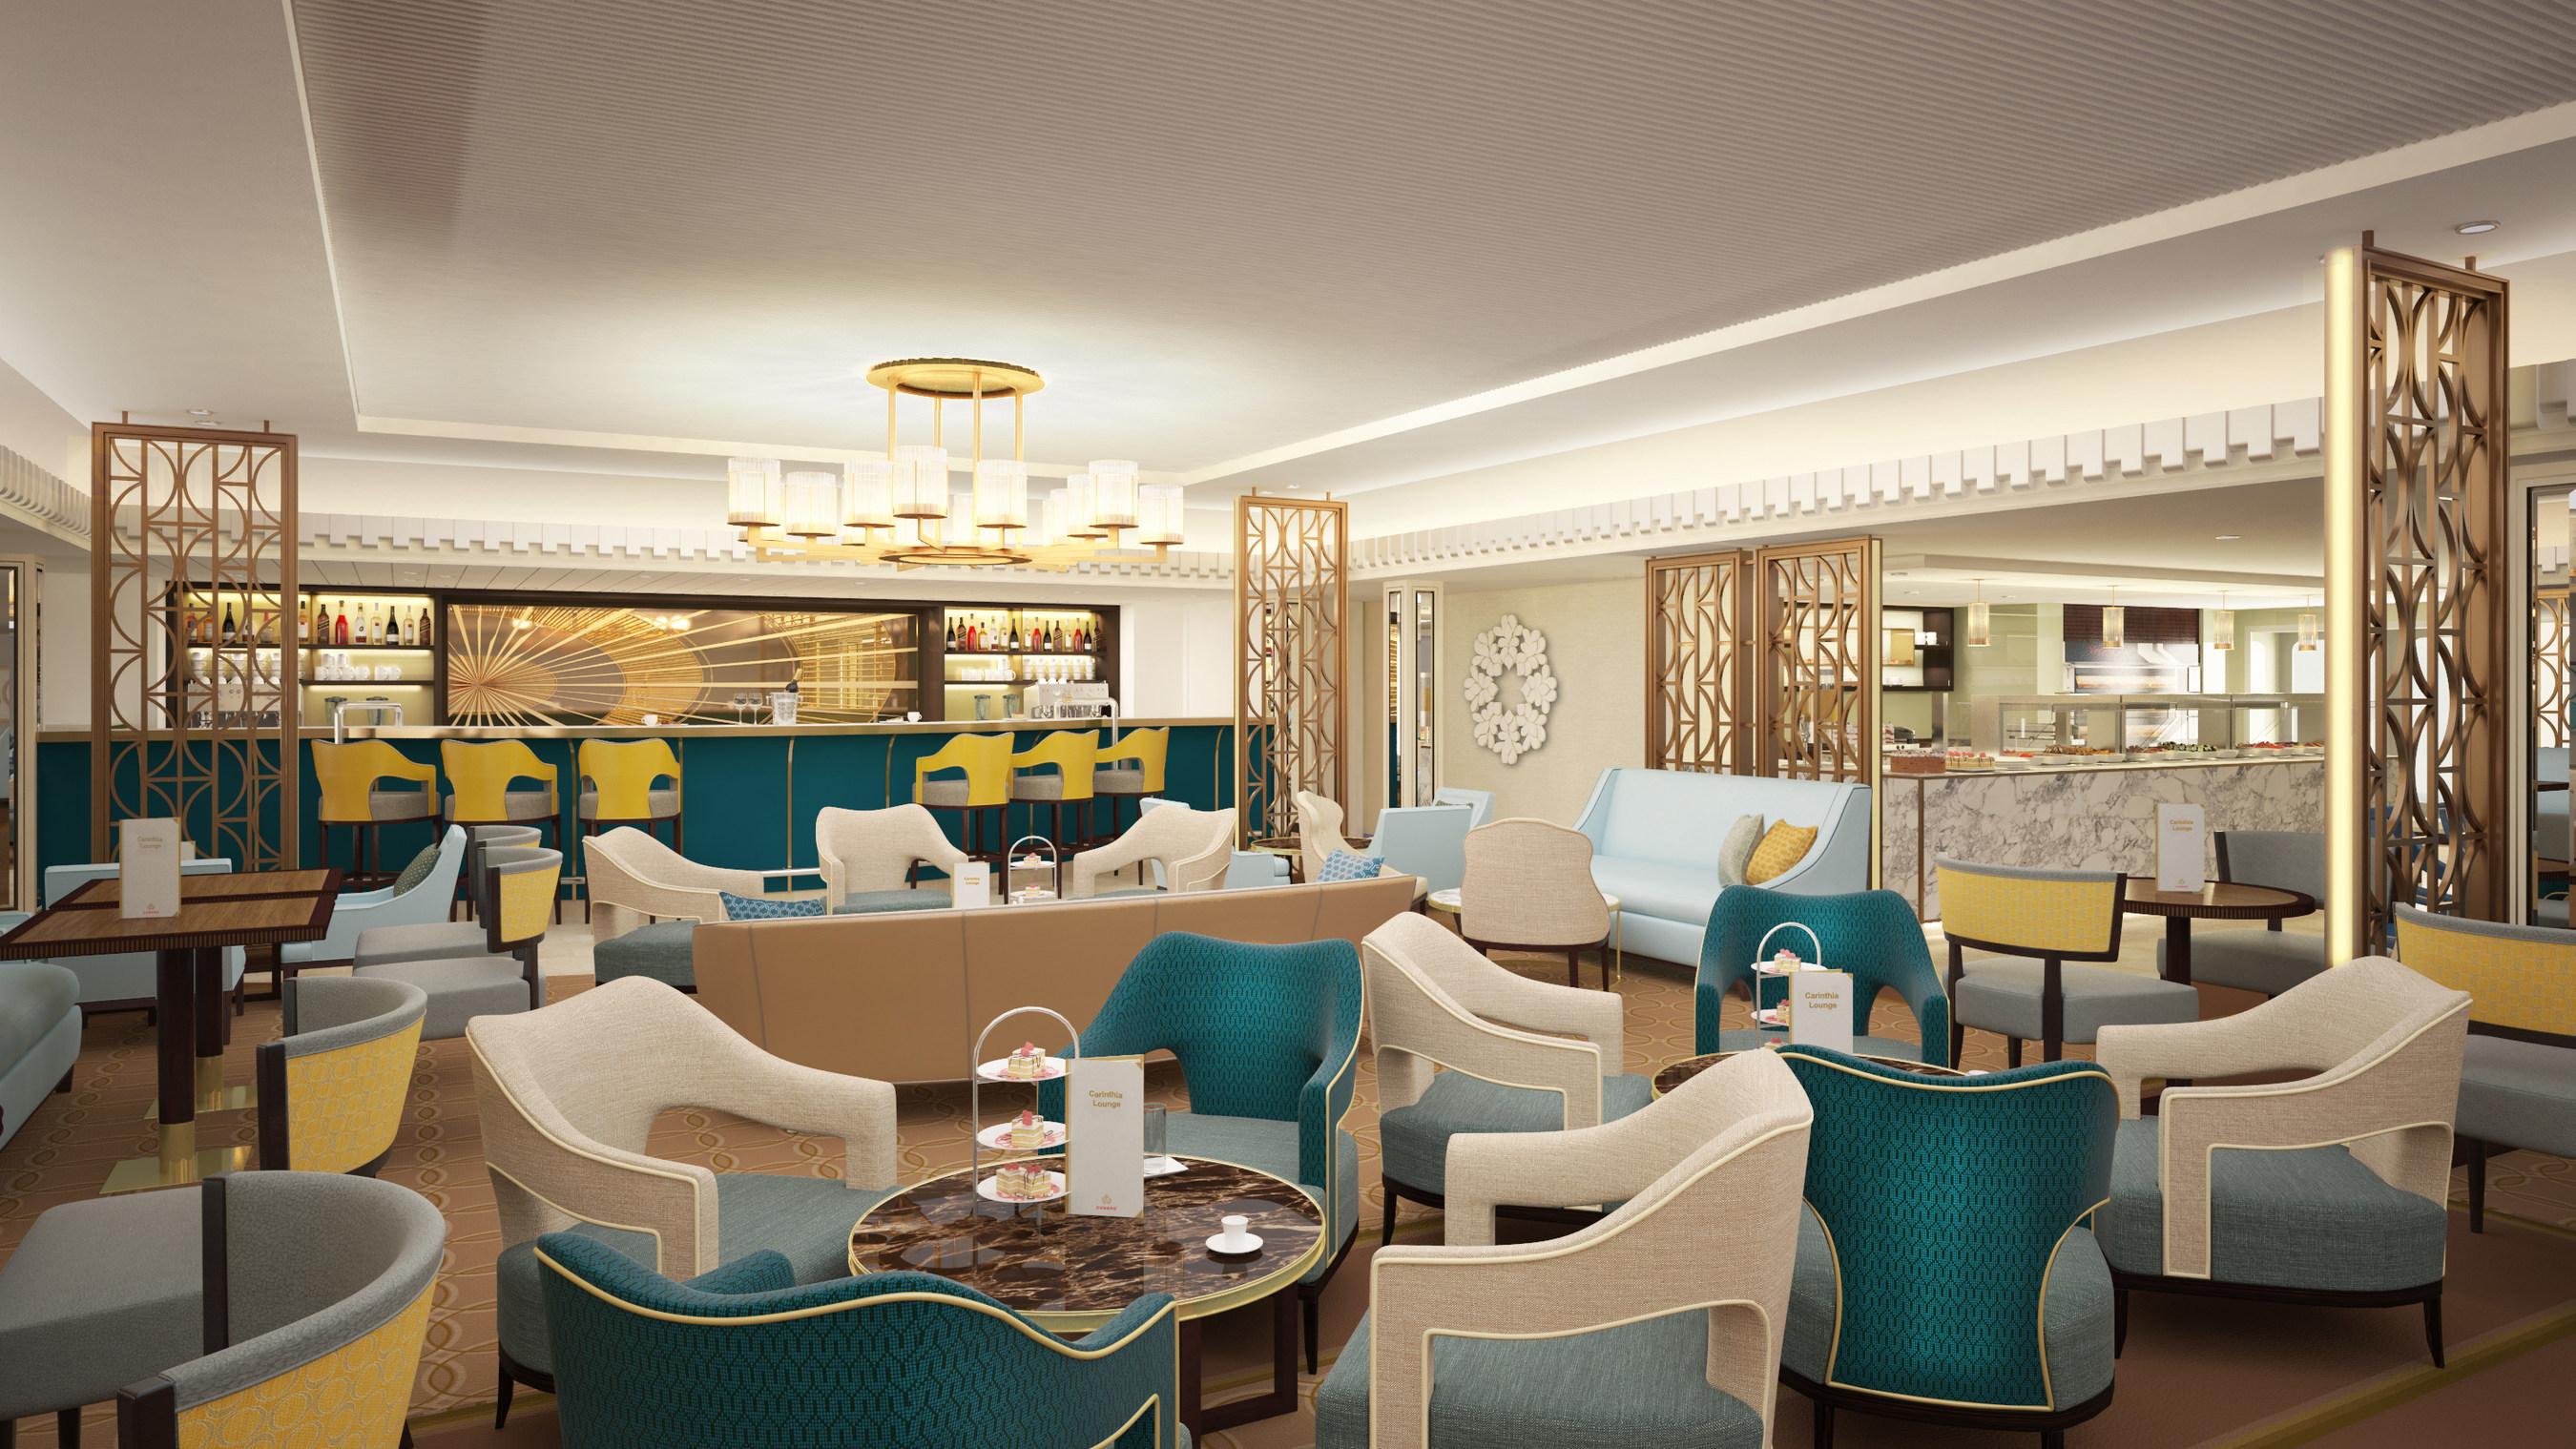 New Carinthia Lounge Rendering